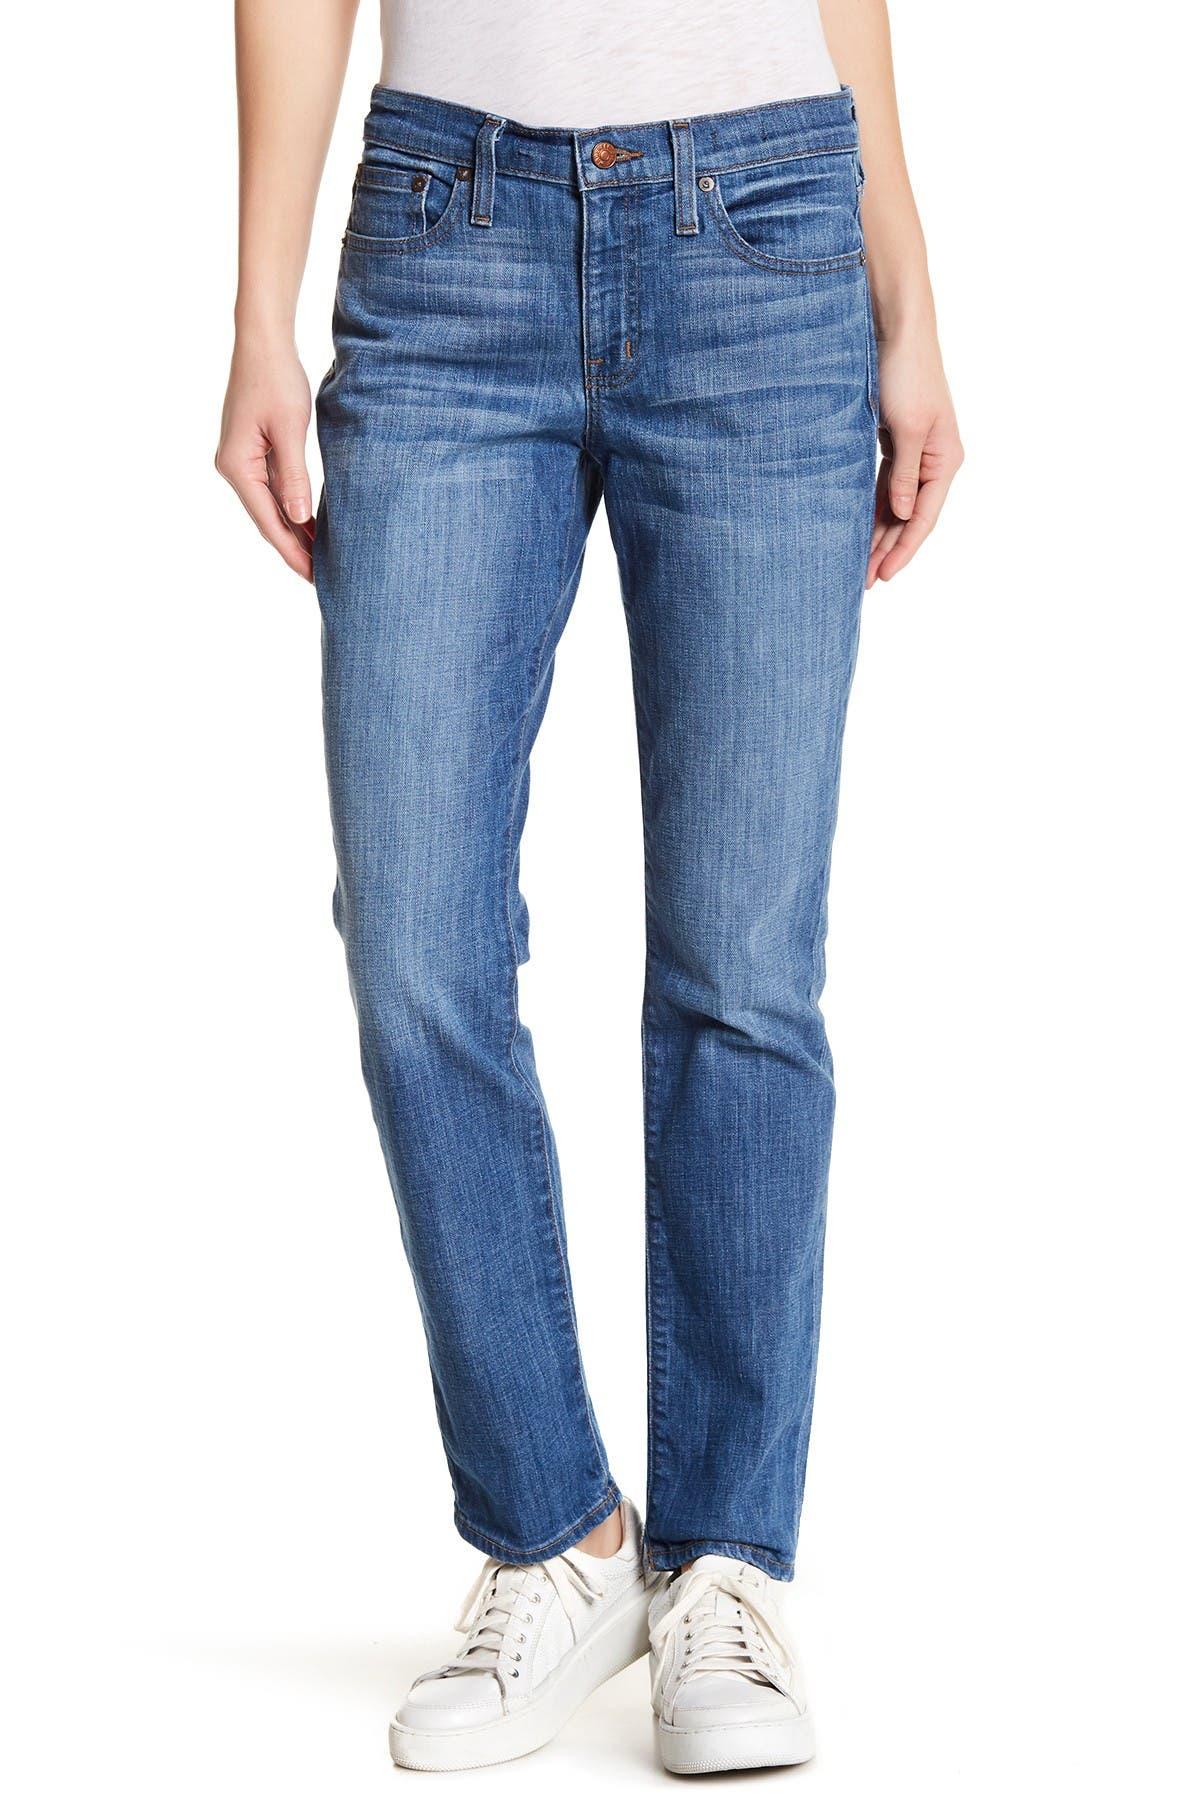 Image of Madewell Slimboy Jeans